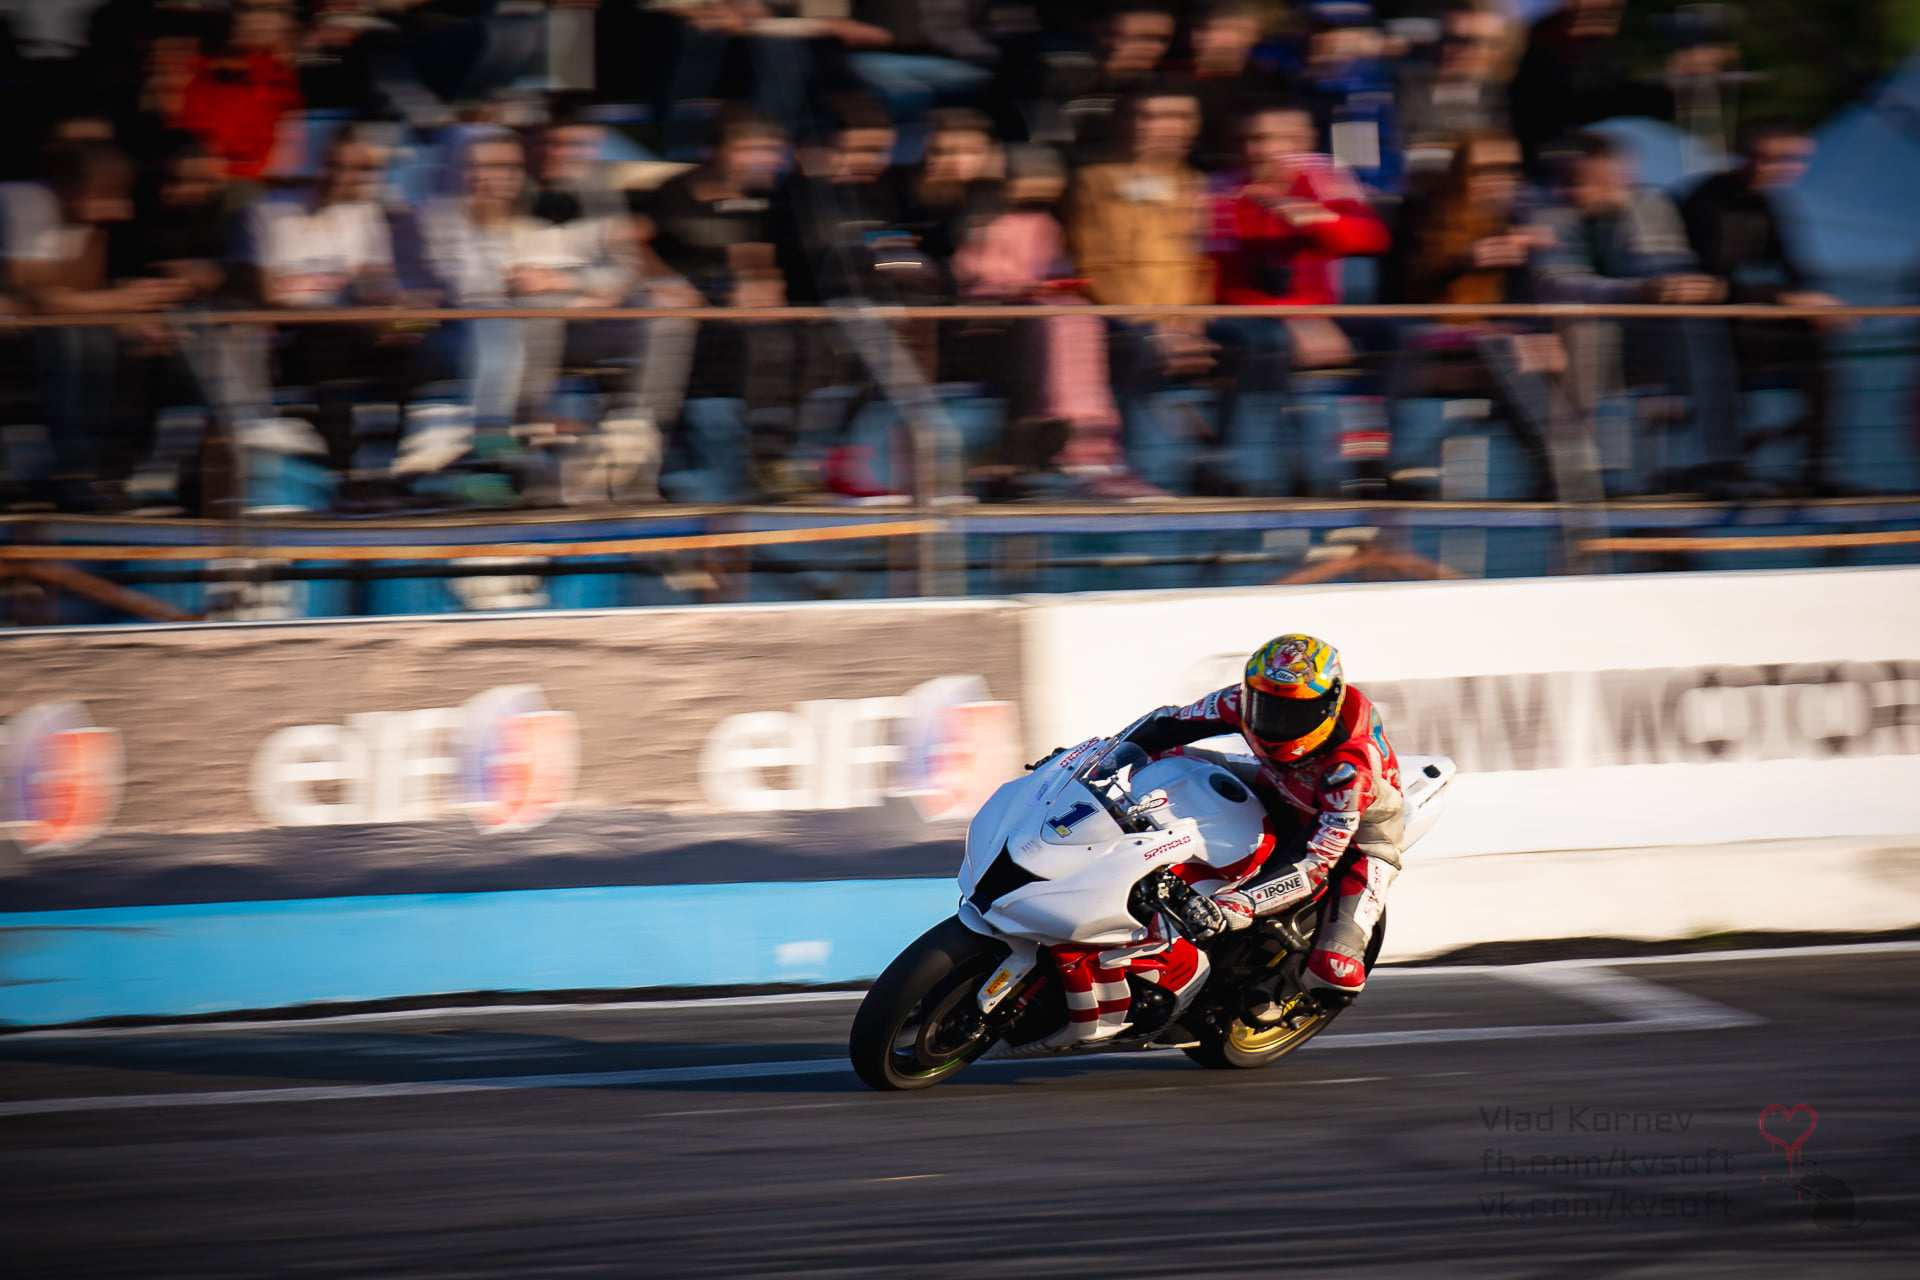 5-6_etap_MotoGPUkraine_054